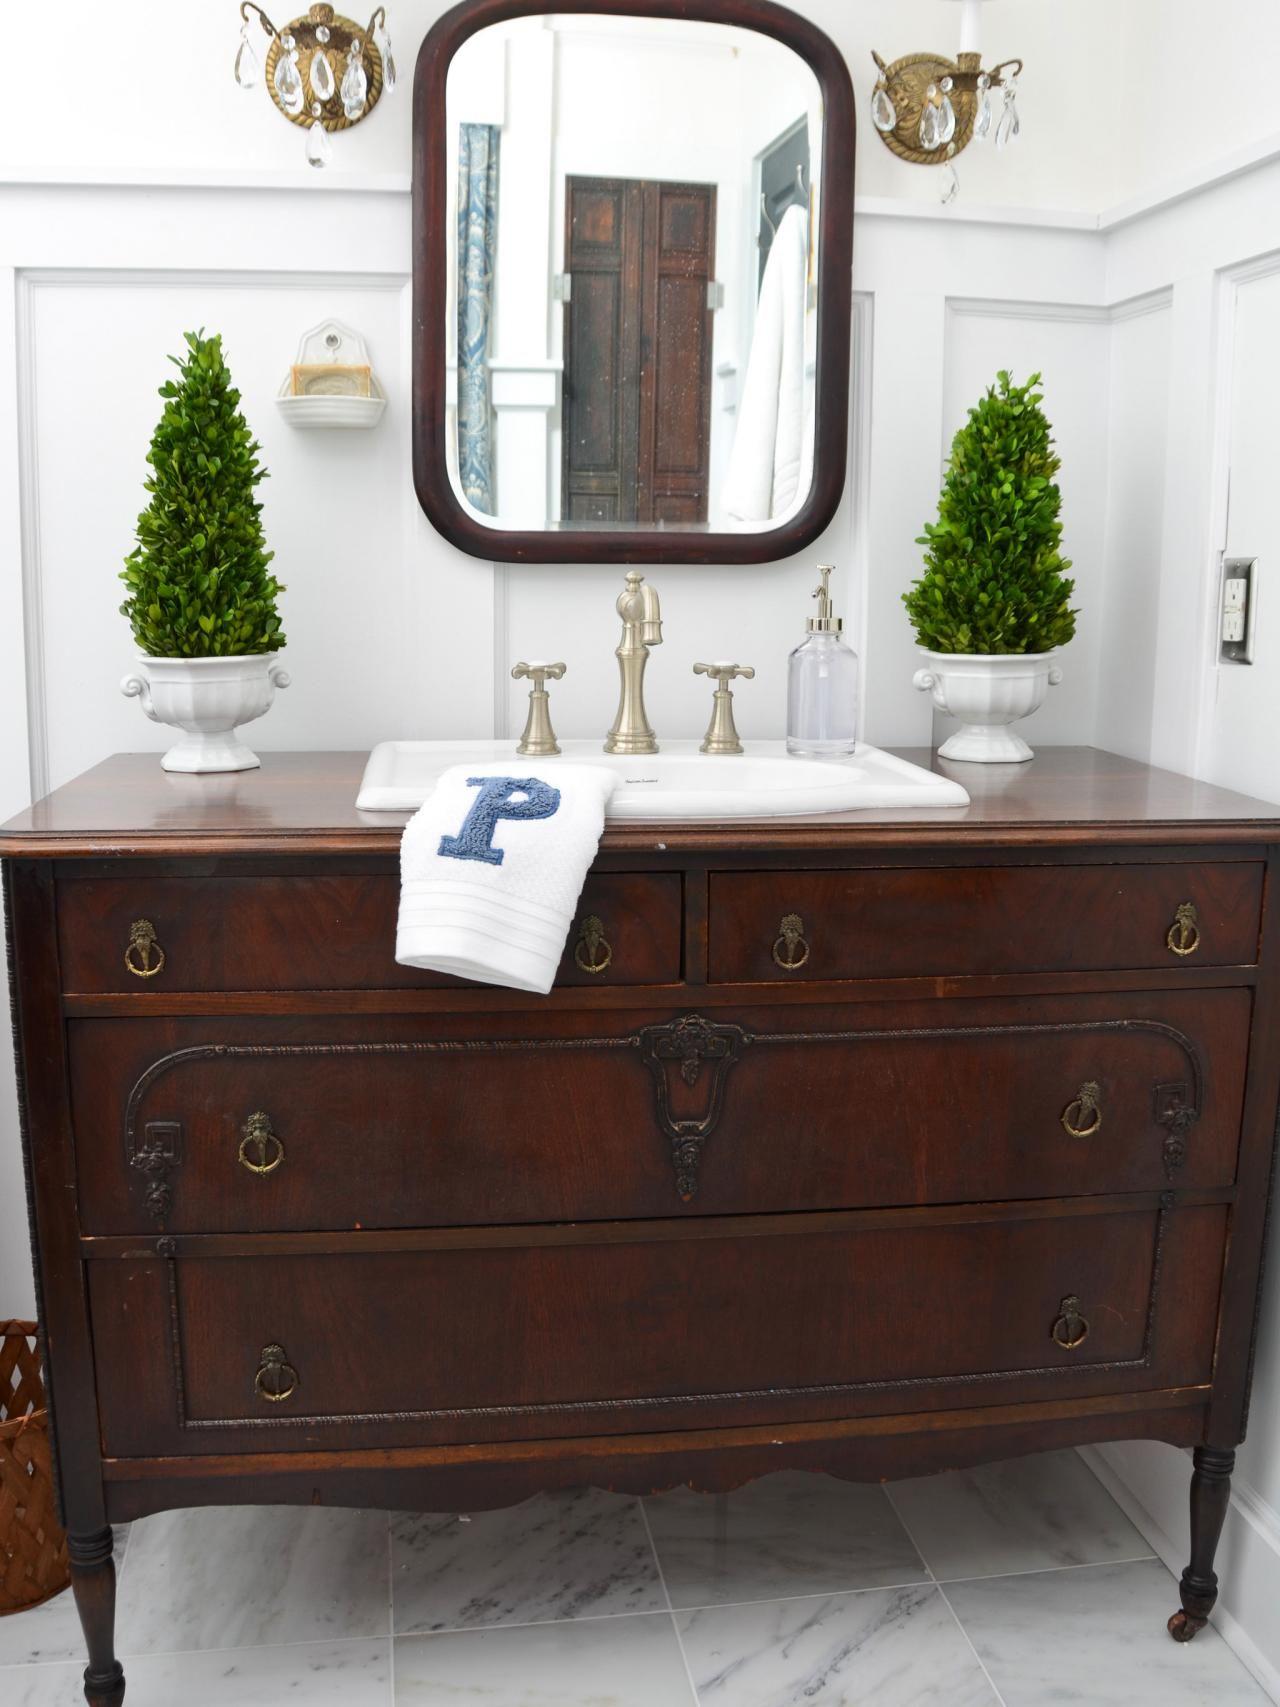 Turn A Vintage Dresser Into A Bathroom Vanity Small Bathroom - Dresser turned bathroom vanity for bathroom decor ideas